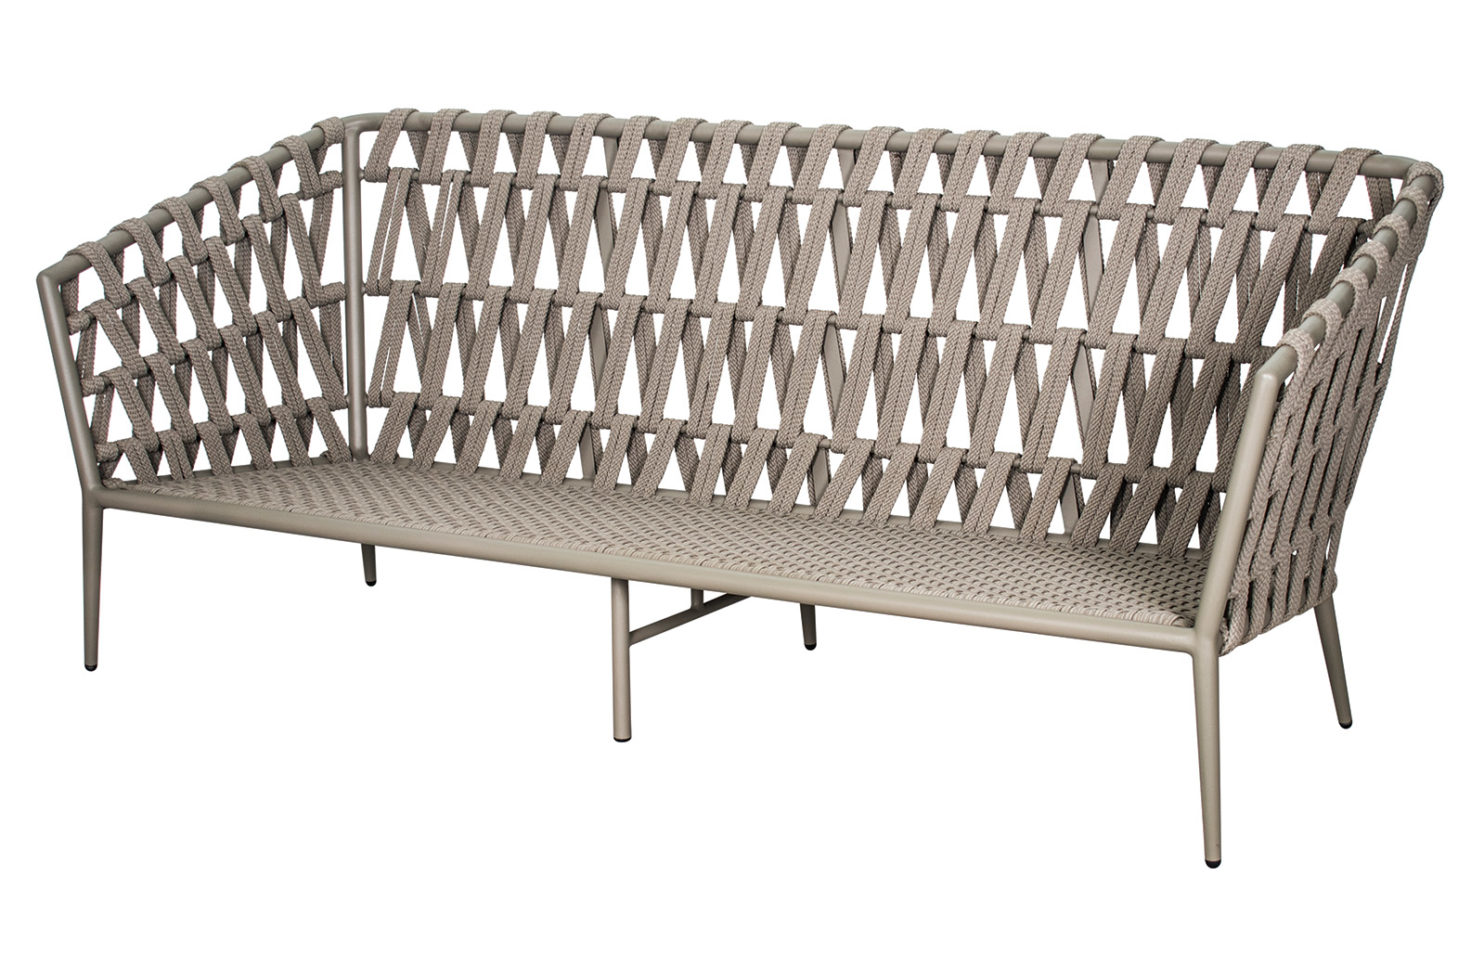 Archipelago andaman sofa 620FT066P2LGT frame 1 3Q